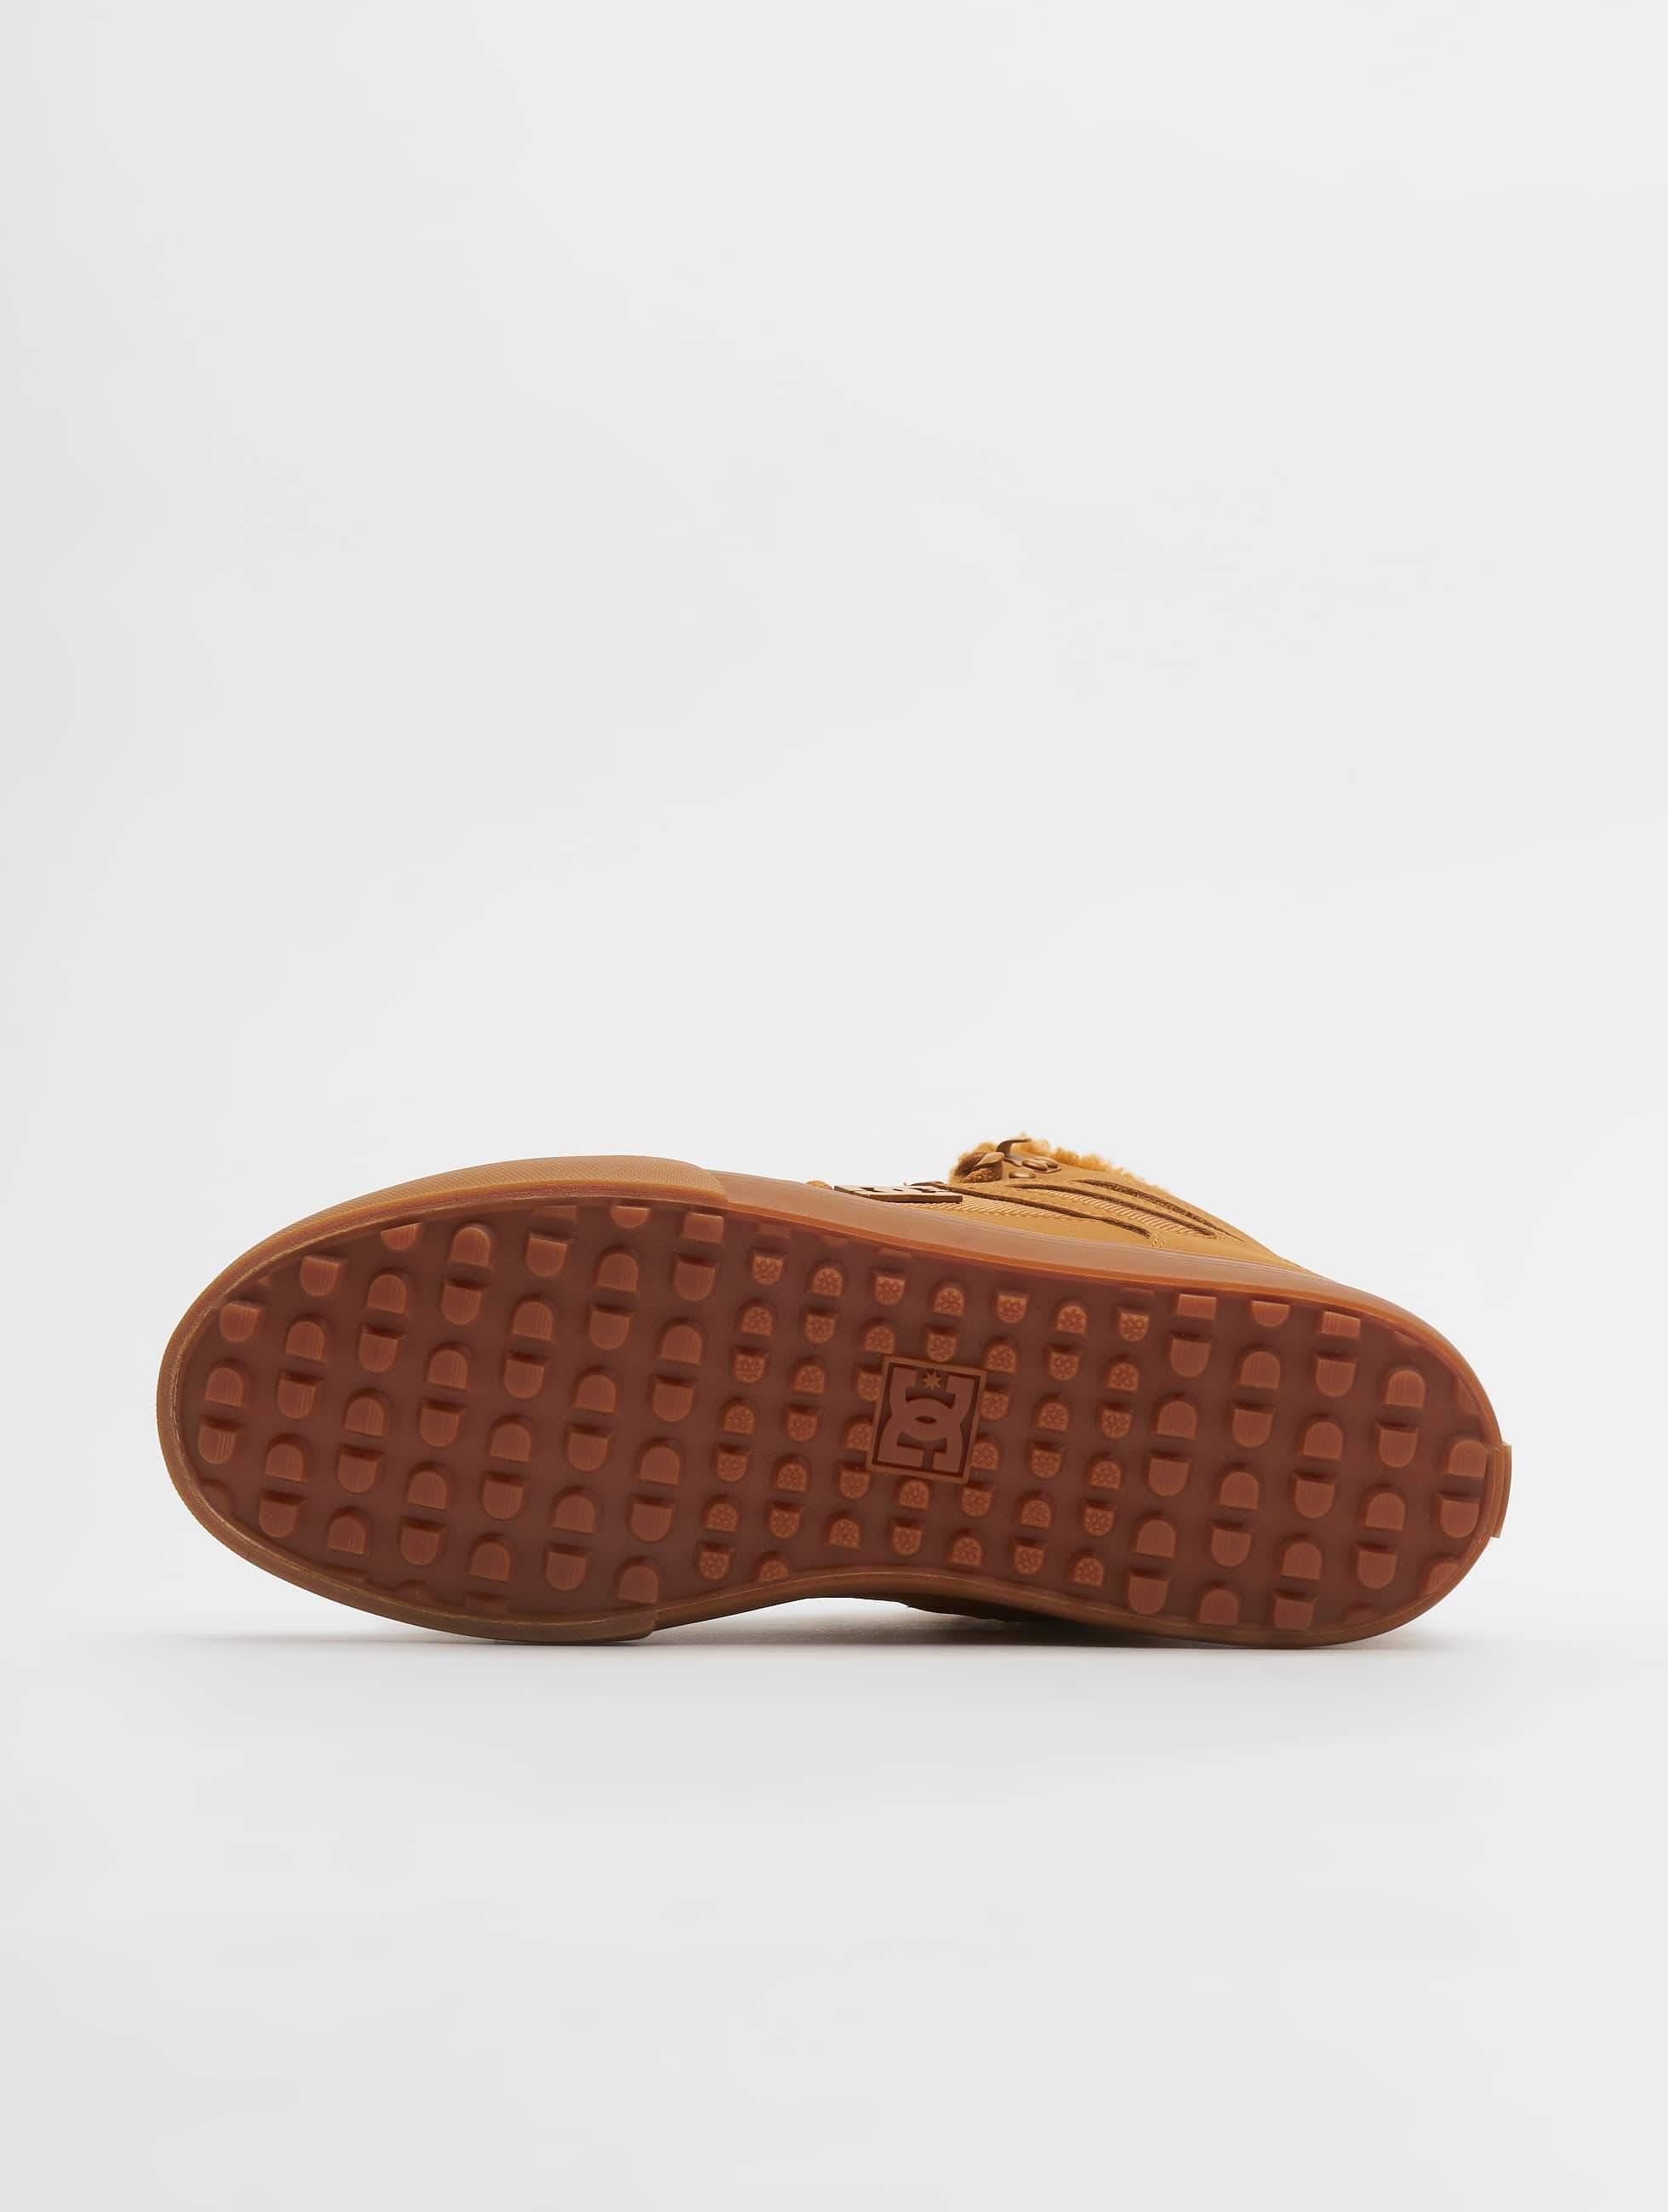 DC Herren Schuhe Schuhe Schuhe   Turnschuhe Pure High Top Wc Wnt 961ac4